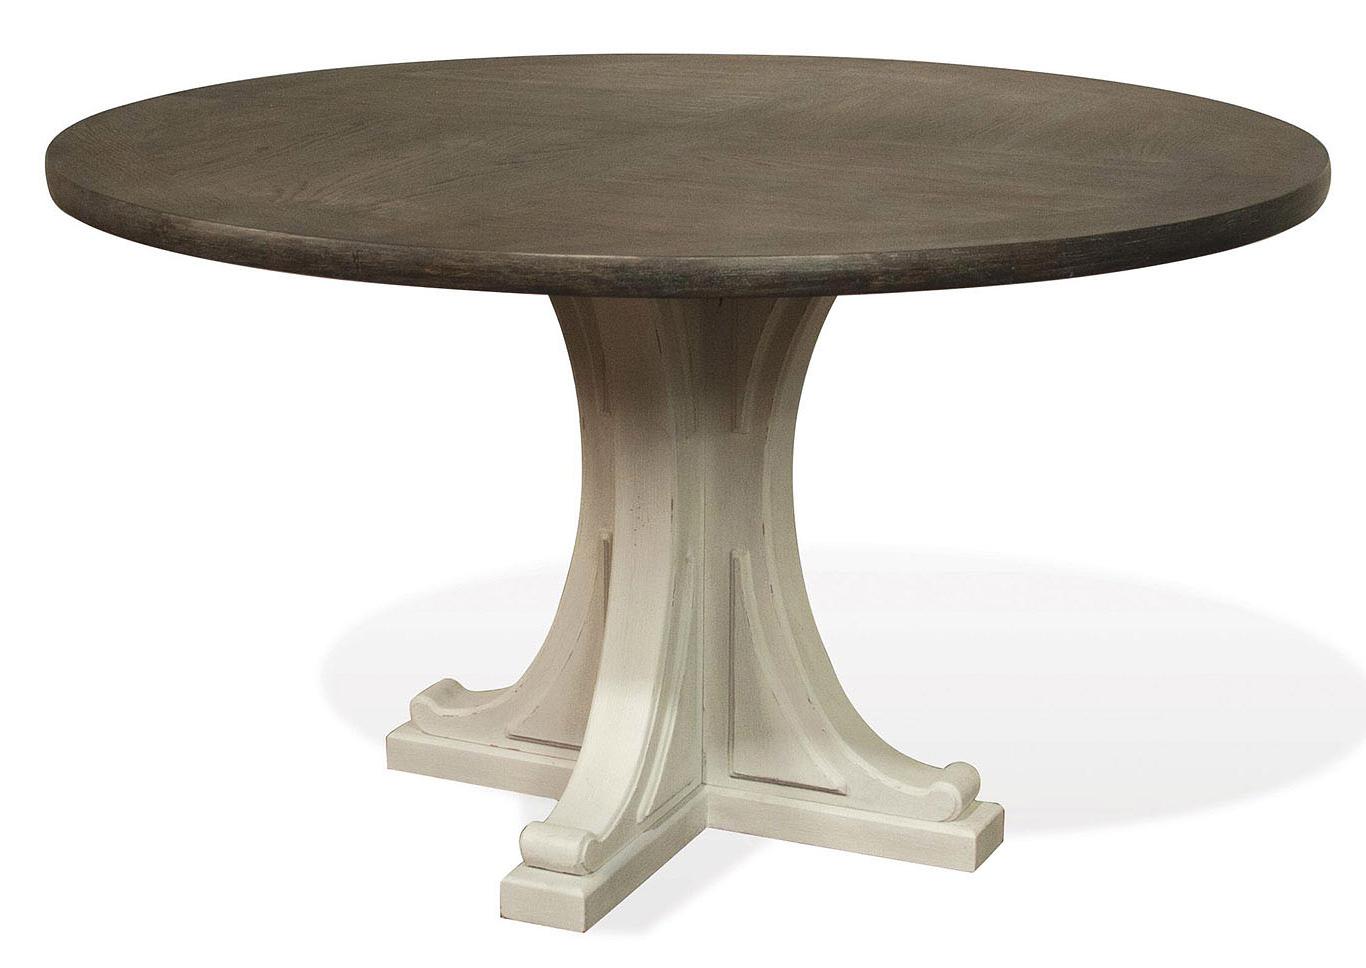 Popular All Brands Furniture – Edison, Greenbrook, North Brunswick Inside Linden Round Pedestal Dining Tables (View 2 of 25)